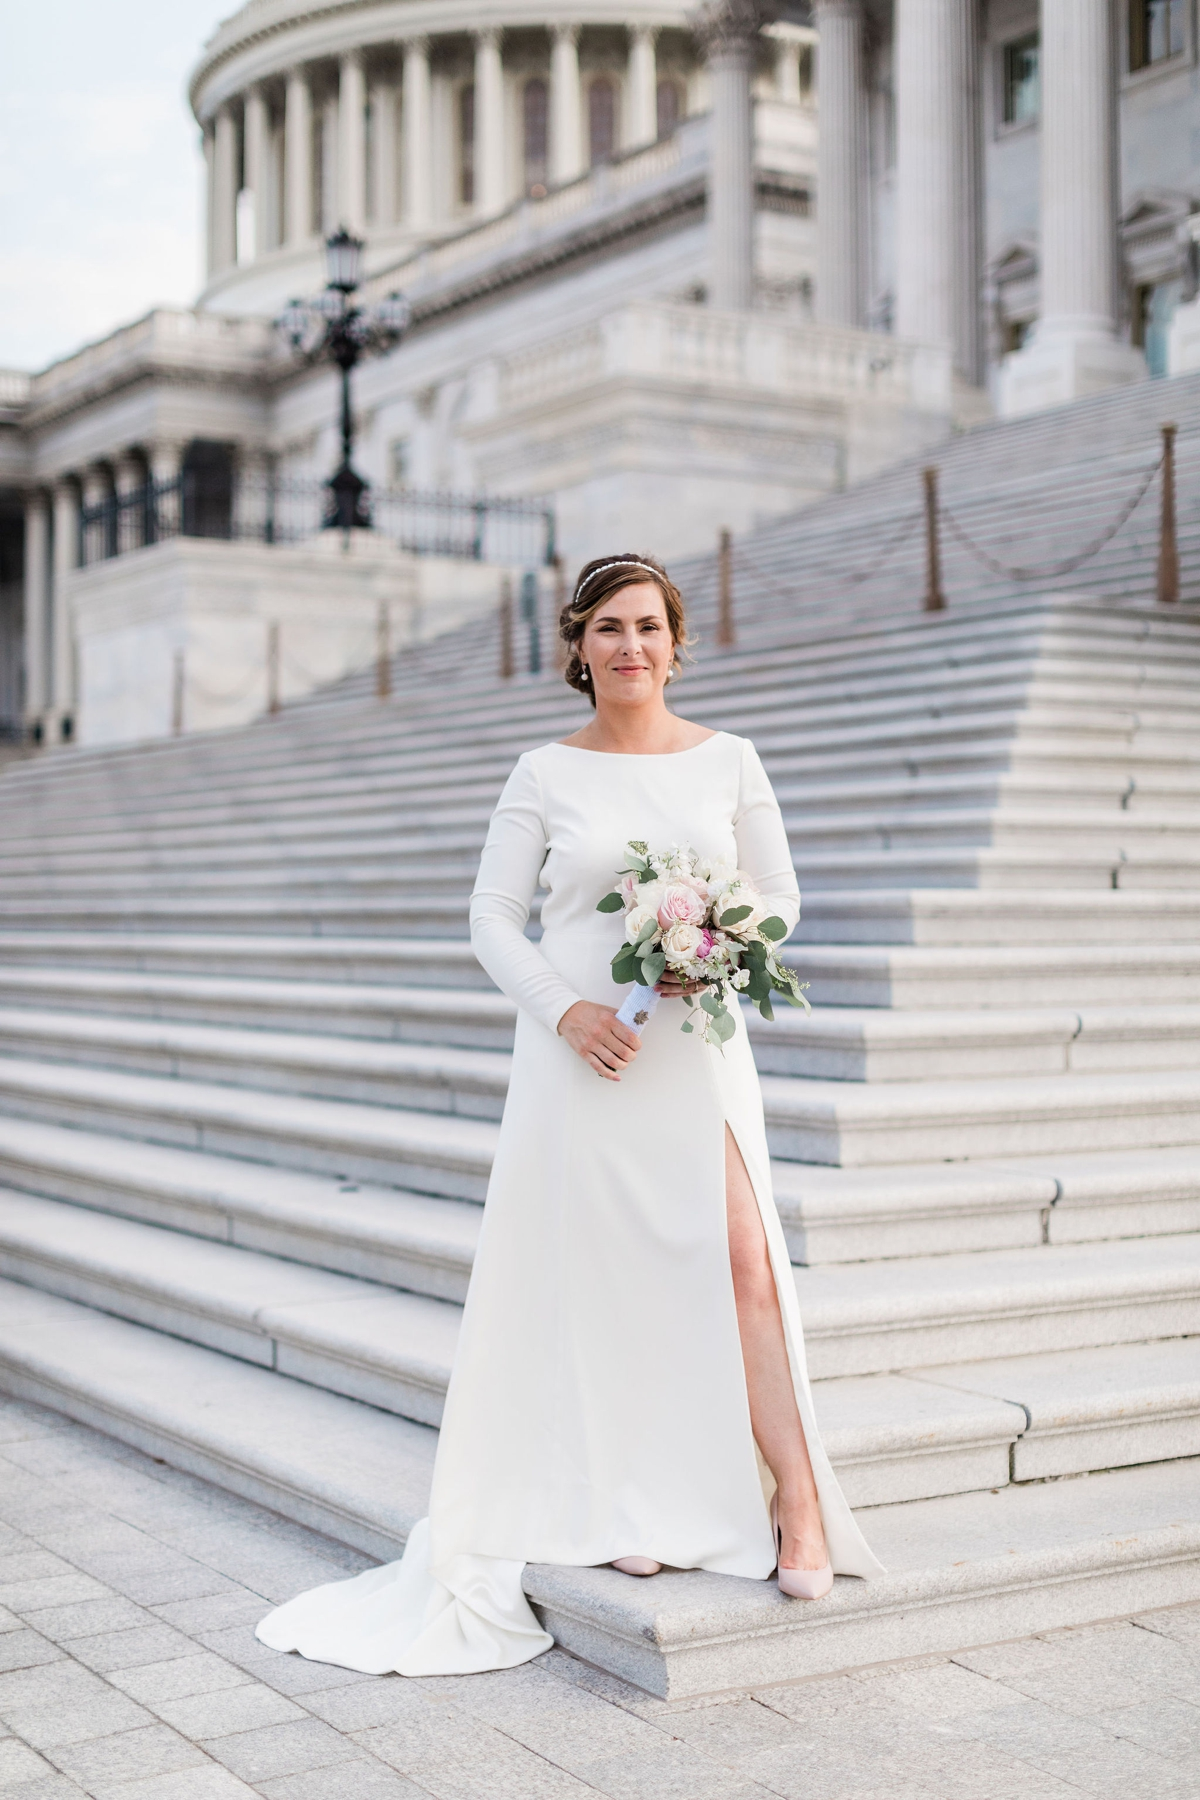 Bride in Amy Kuschel Redding Gown from BHLDN